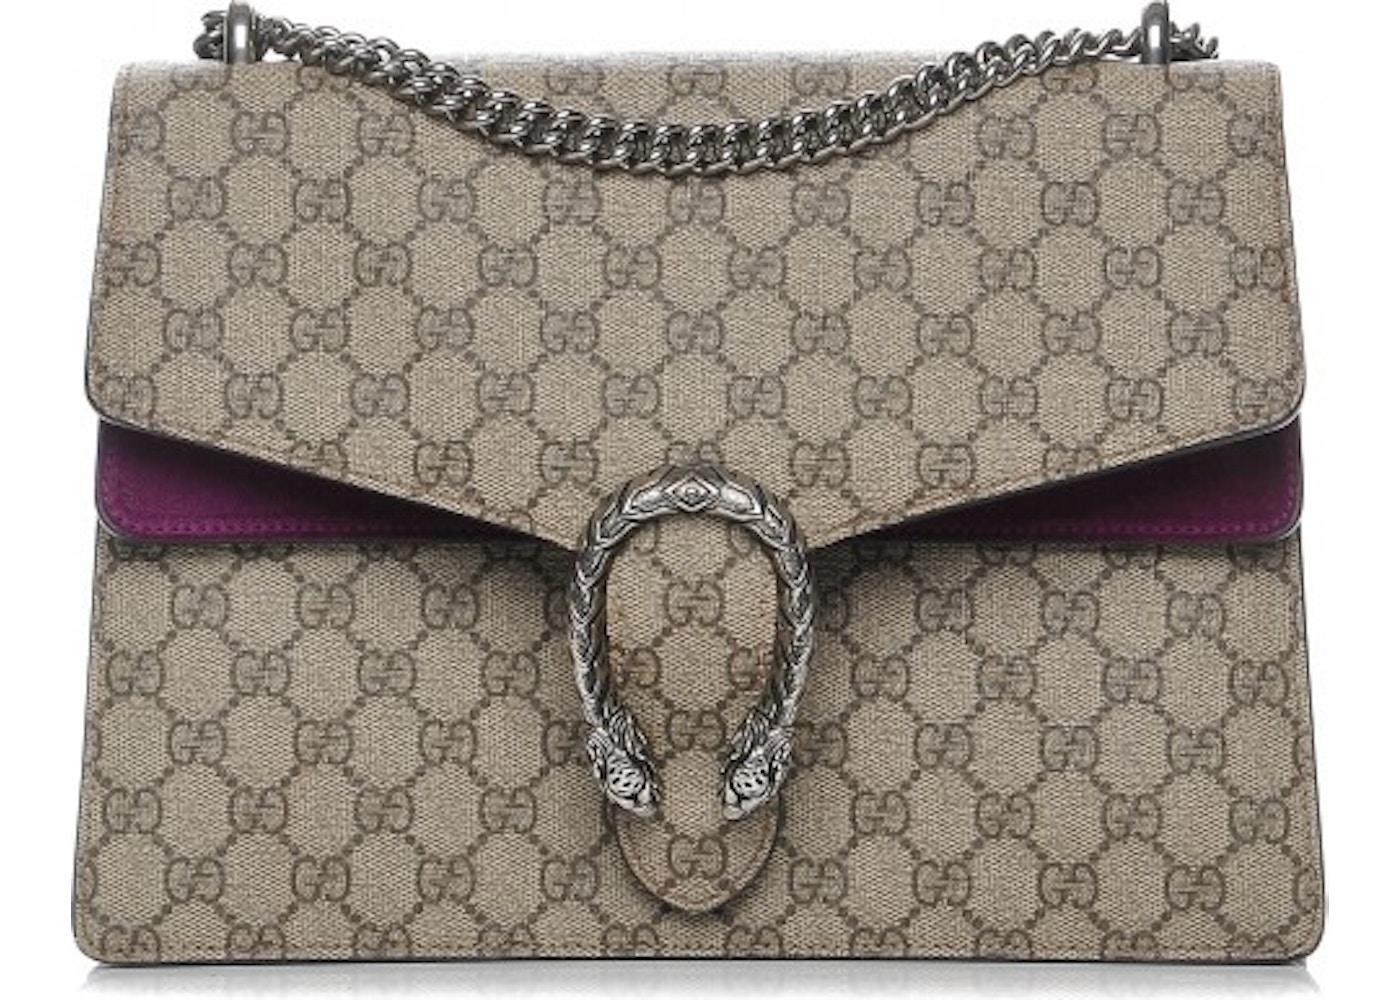 9b62d5b0838 Gucci Dionysus Shoulder Bag Monogram GG Medium Taupe Beige Purple. Monogram  GG Medium Taupe Beige Purple